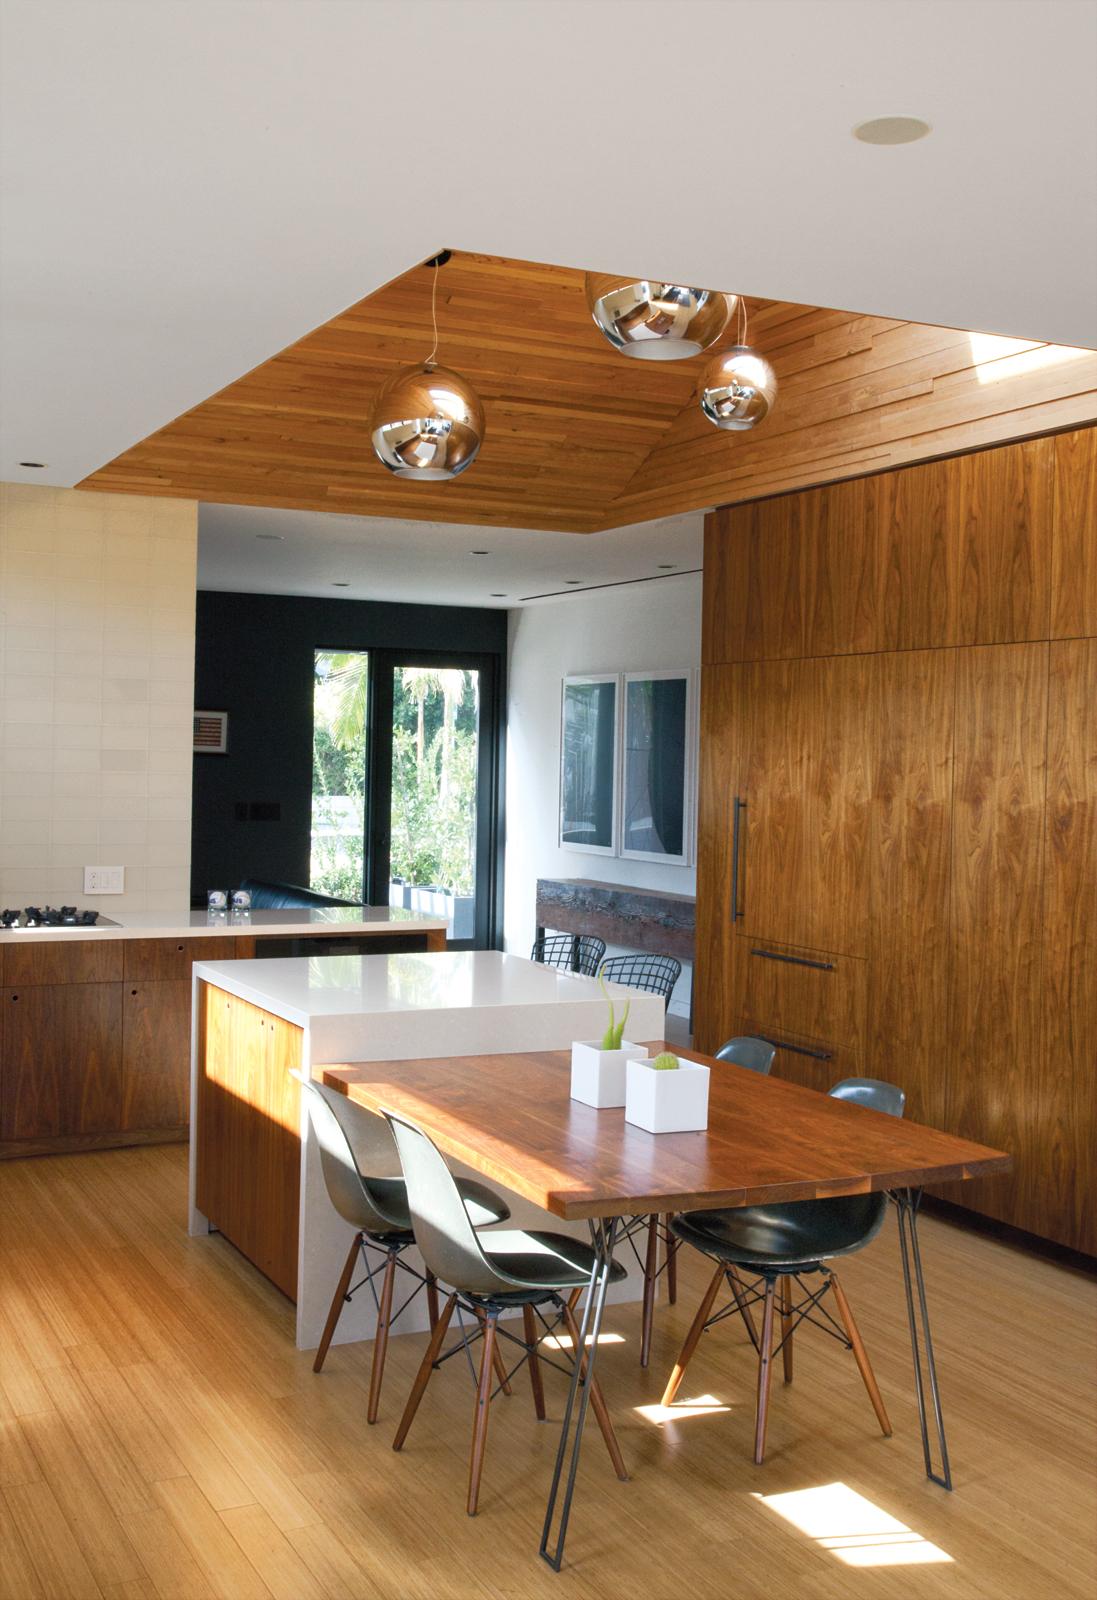 Custom walnut dining furniture in modern kitchen